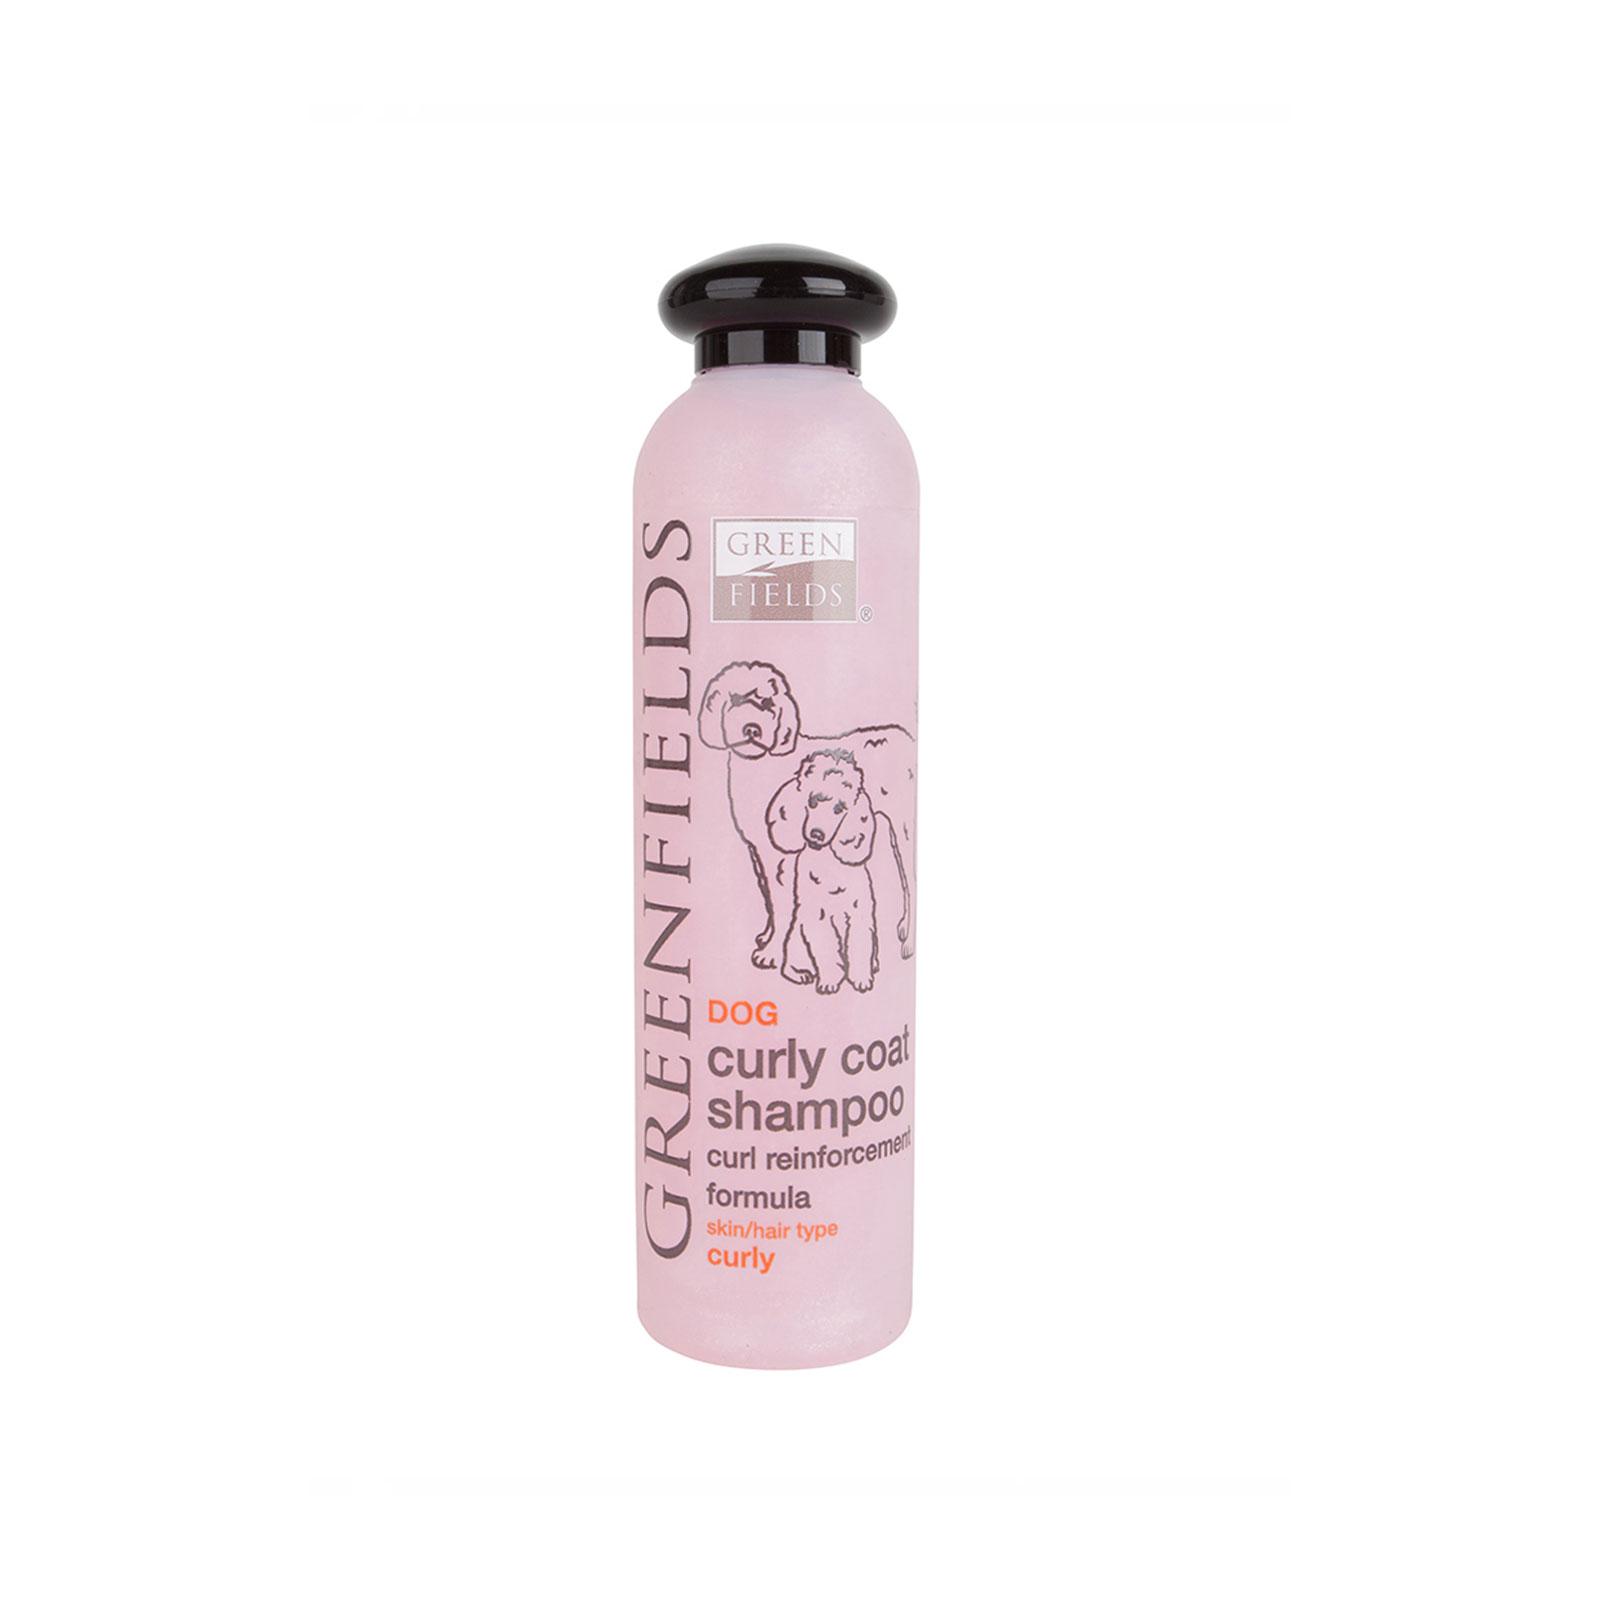 Greenfields -  Dog curly coat shampoo - Šampon za pse sa kovrdžavom dlakom